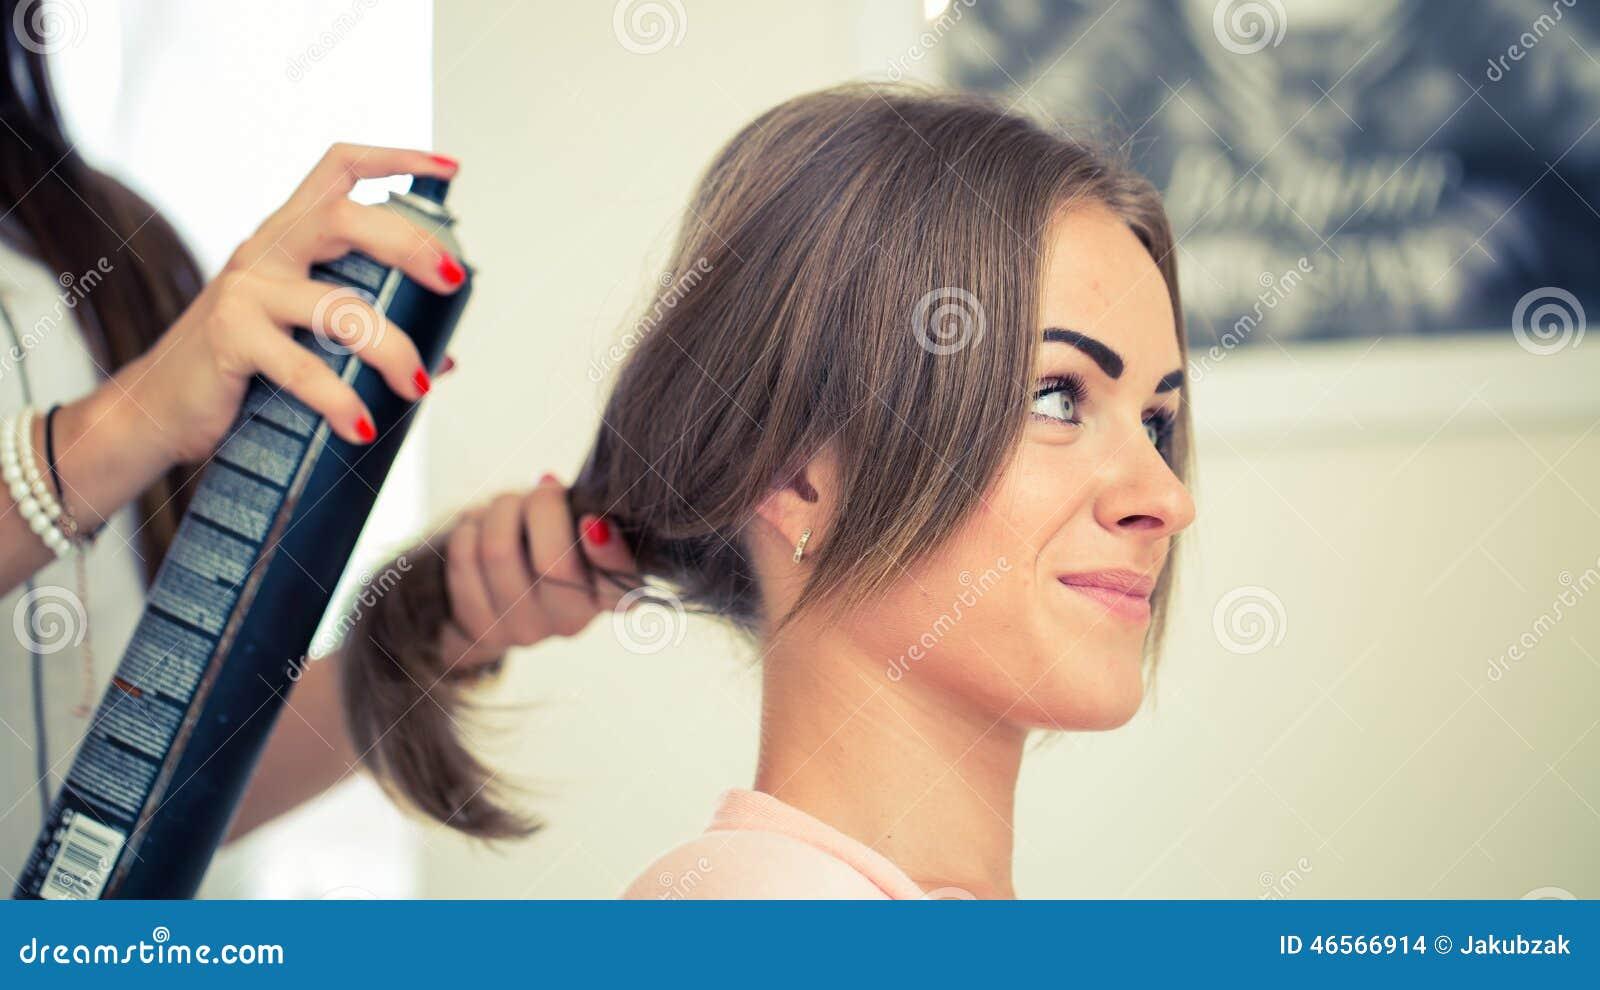 hairdressing salon business plan